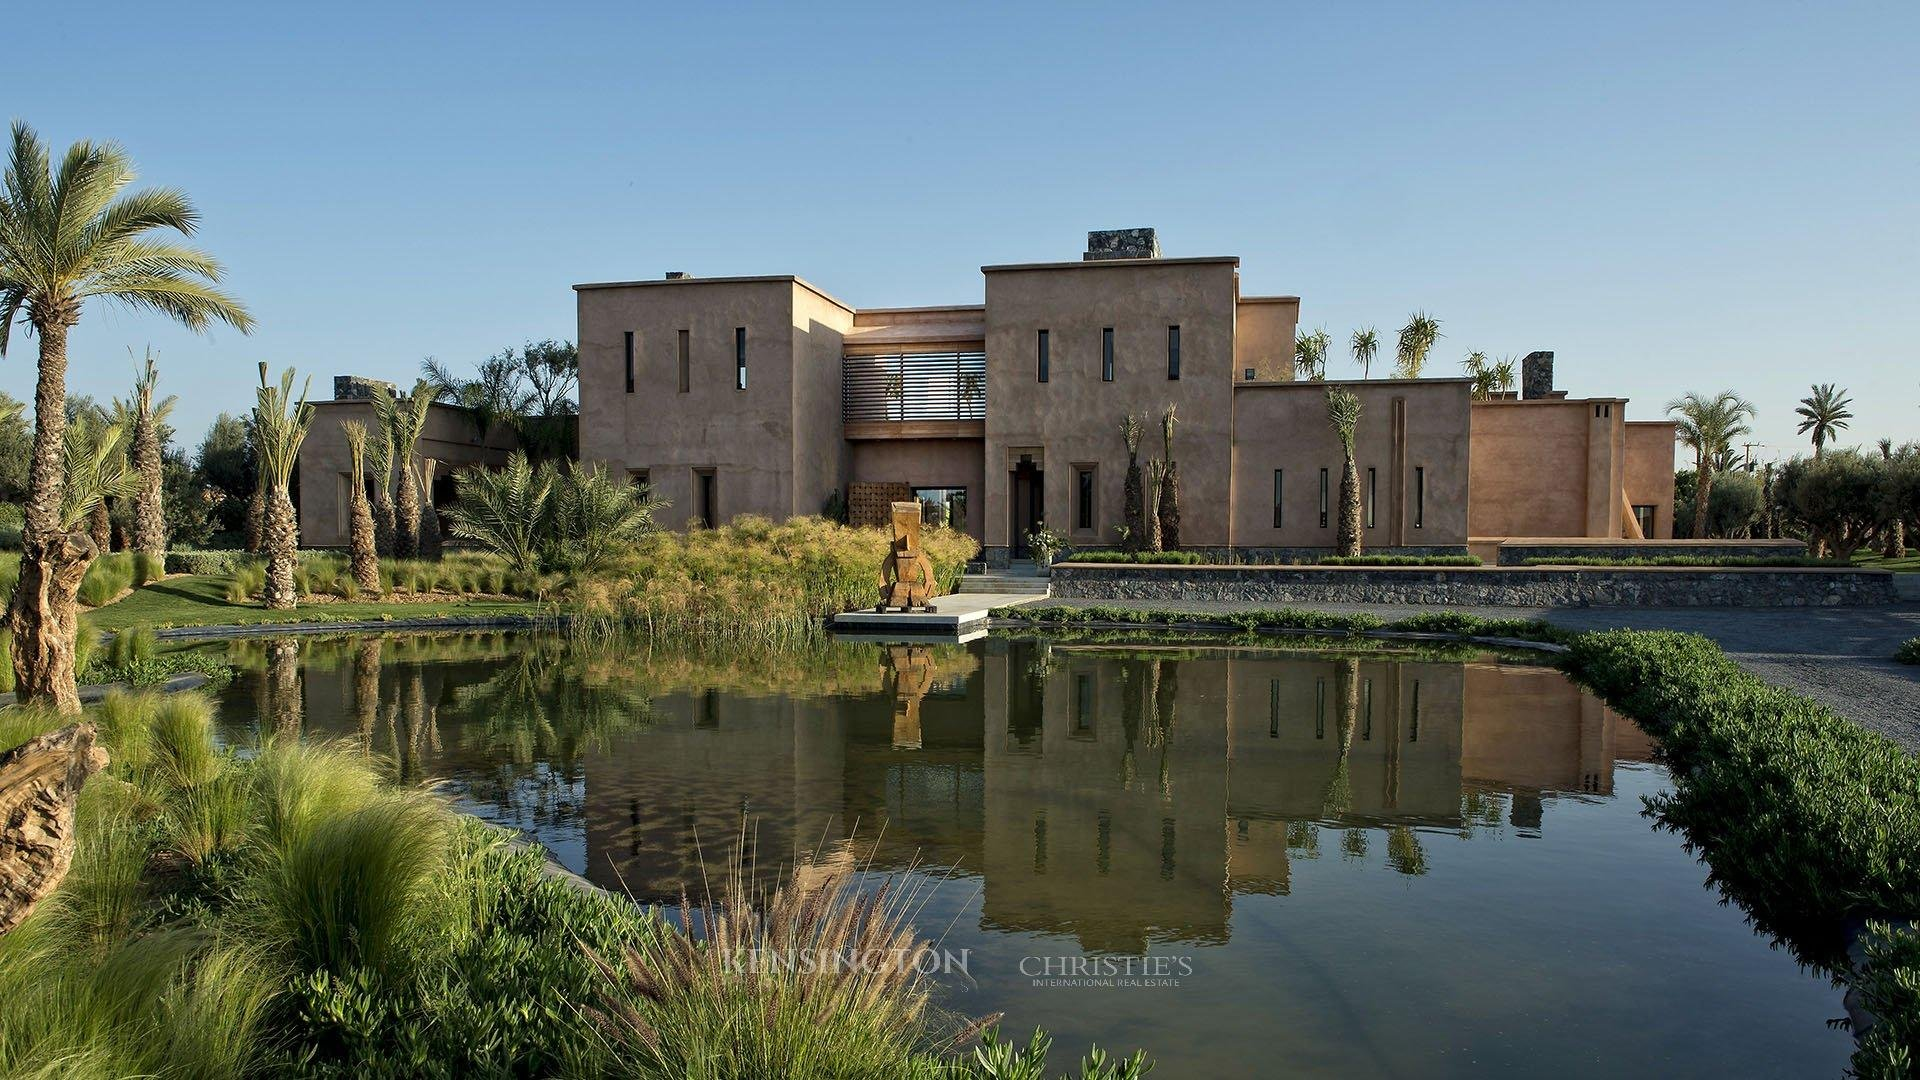 KPPM00733: Villa Soan Luxury Villa Marrakech Morocco